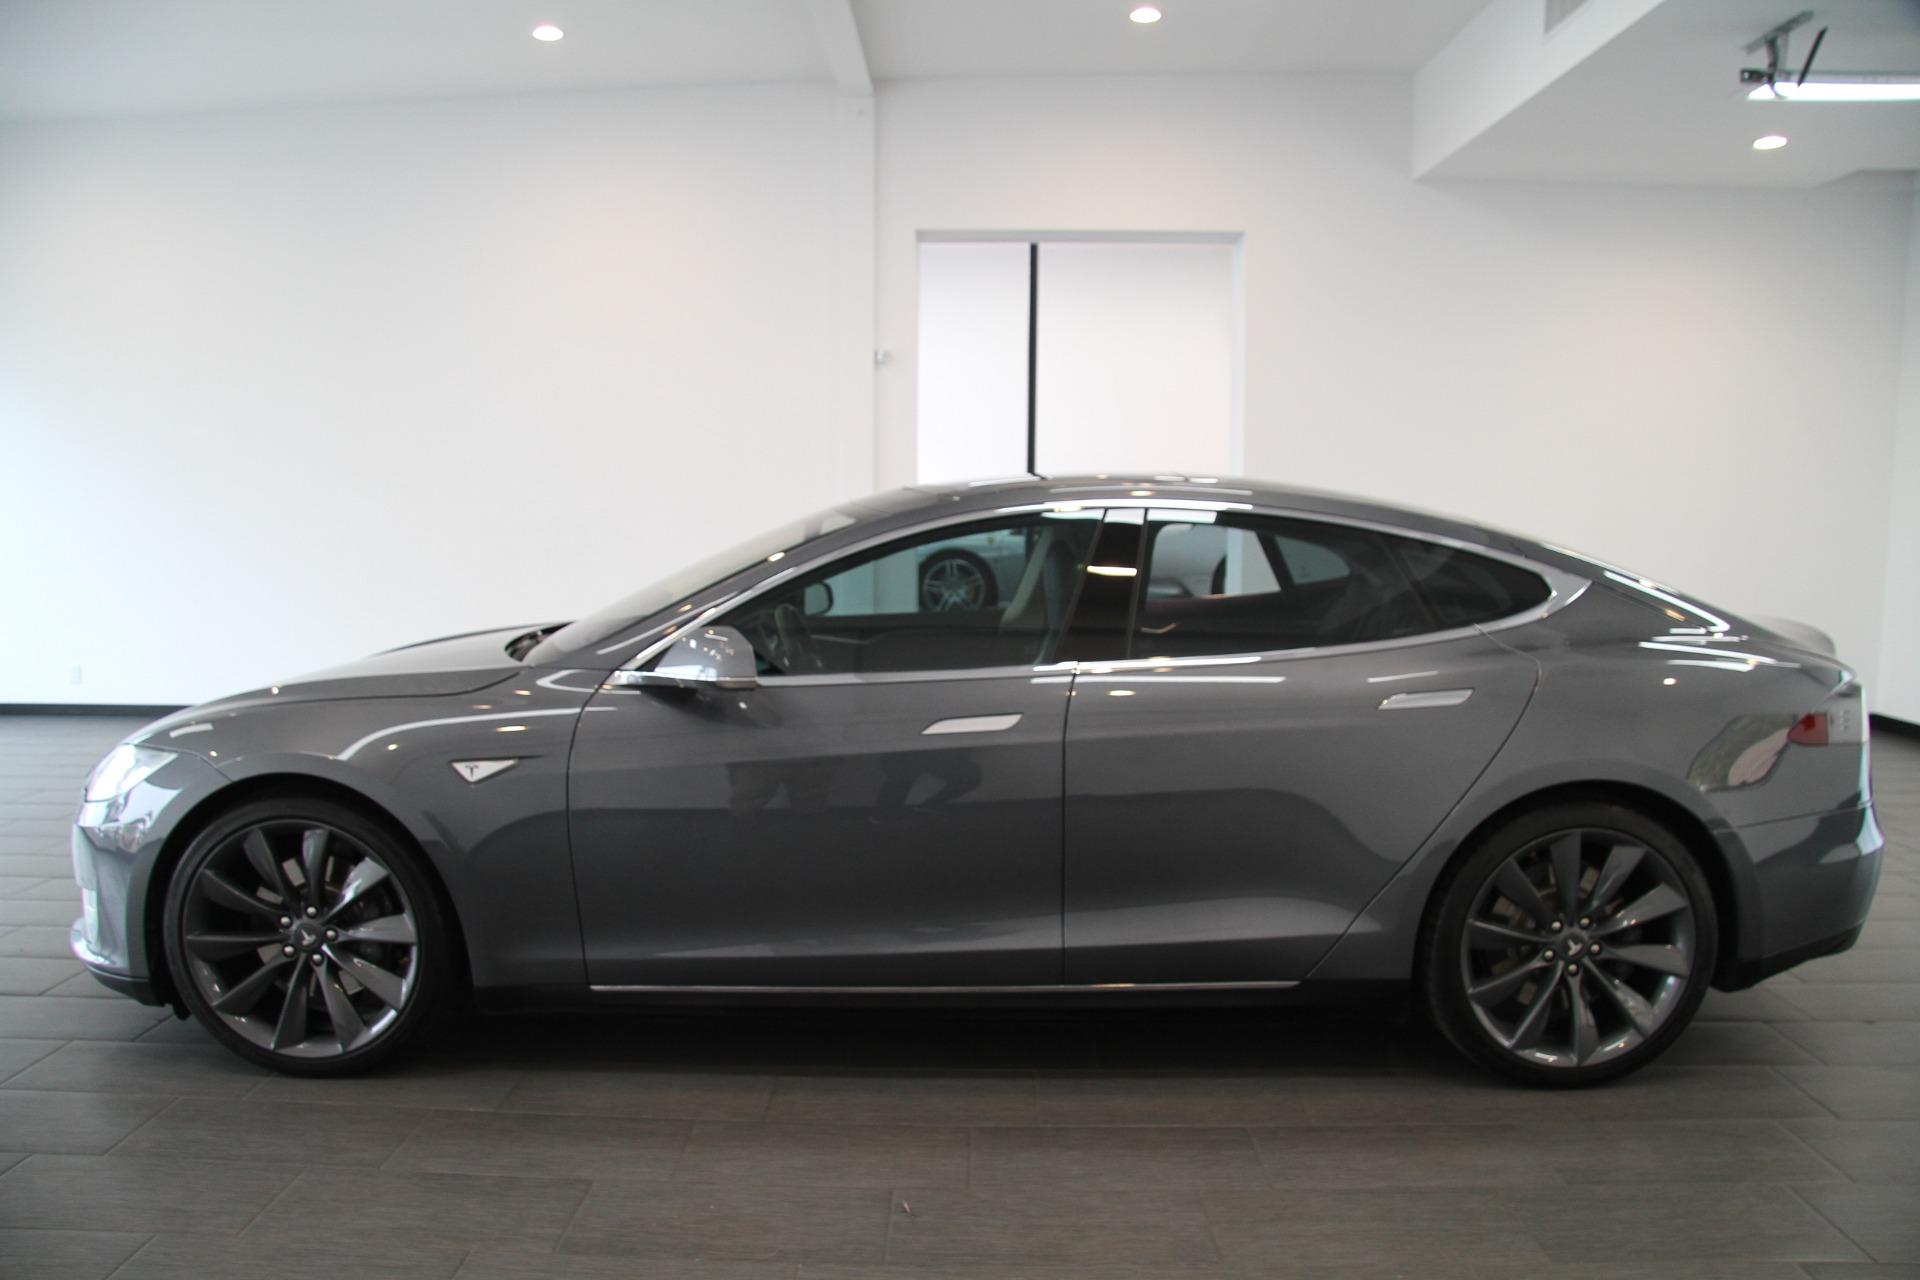 Used Vehicles Near Me >> 2013 Tesla Model S P85 Stock # 6095 for sale near Redondo ...